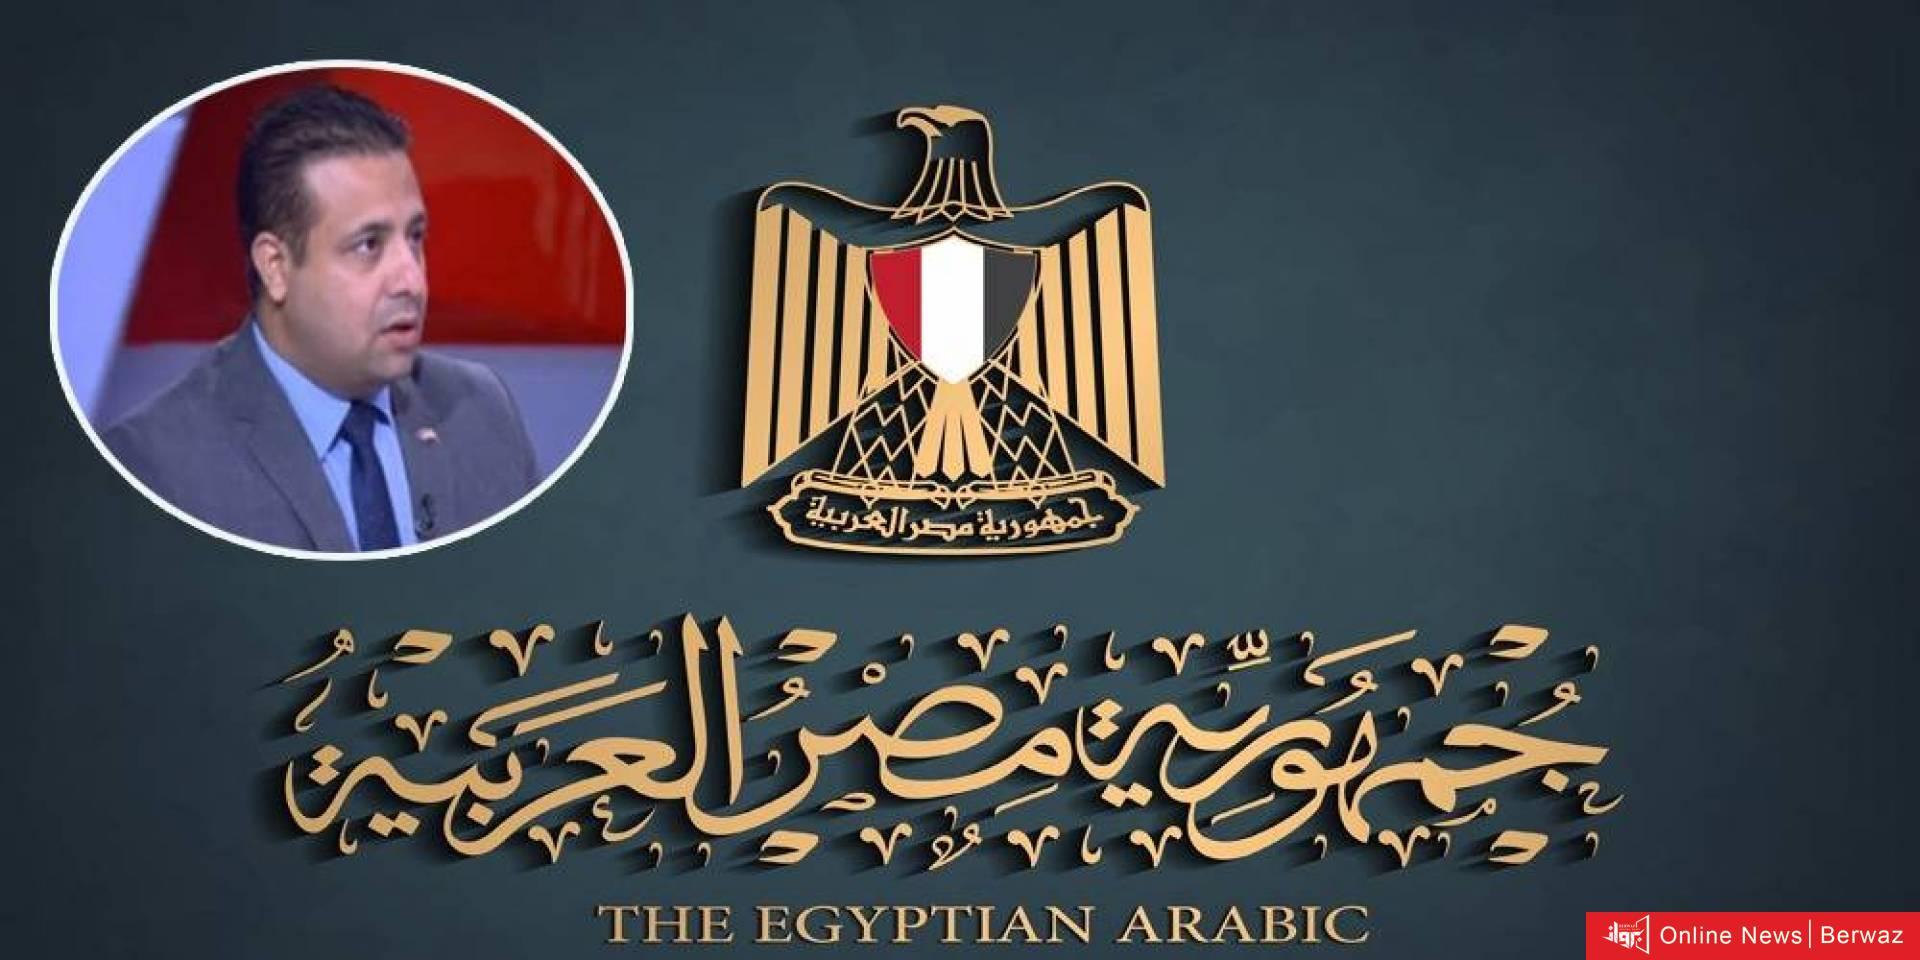 WhatsAppImage2020 10 24at13546PM 591382 highres - بعد إساءته للكويت.. مصر تقيل معاون وزير القوى العامة